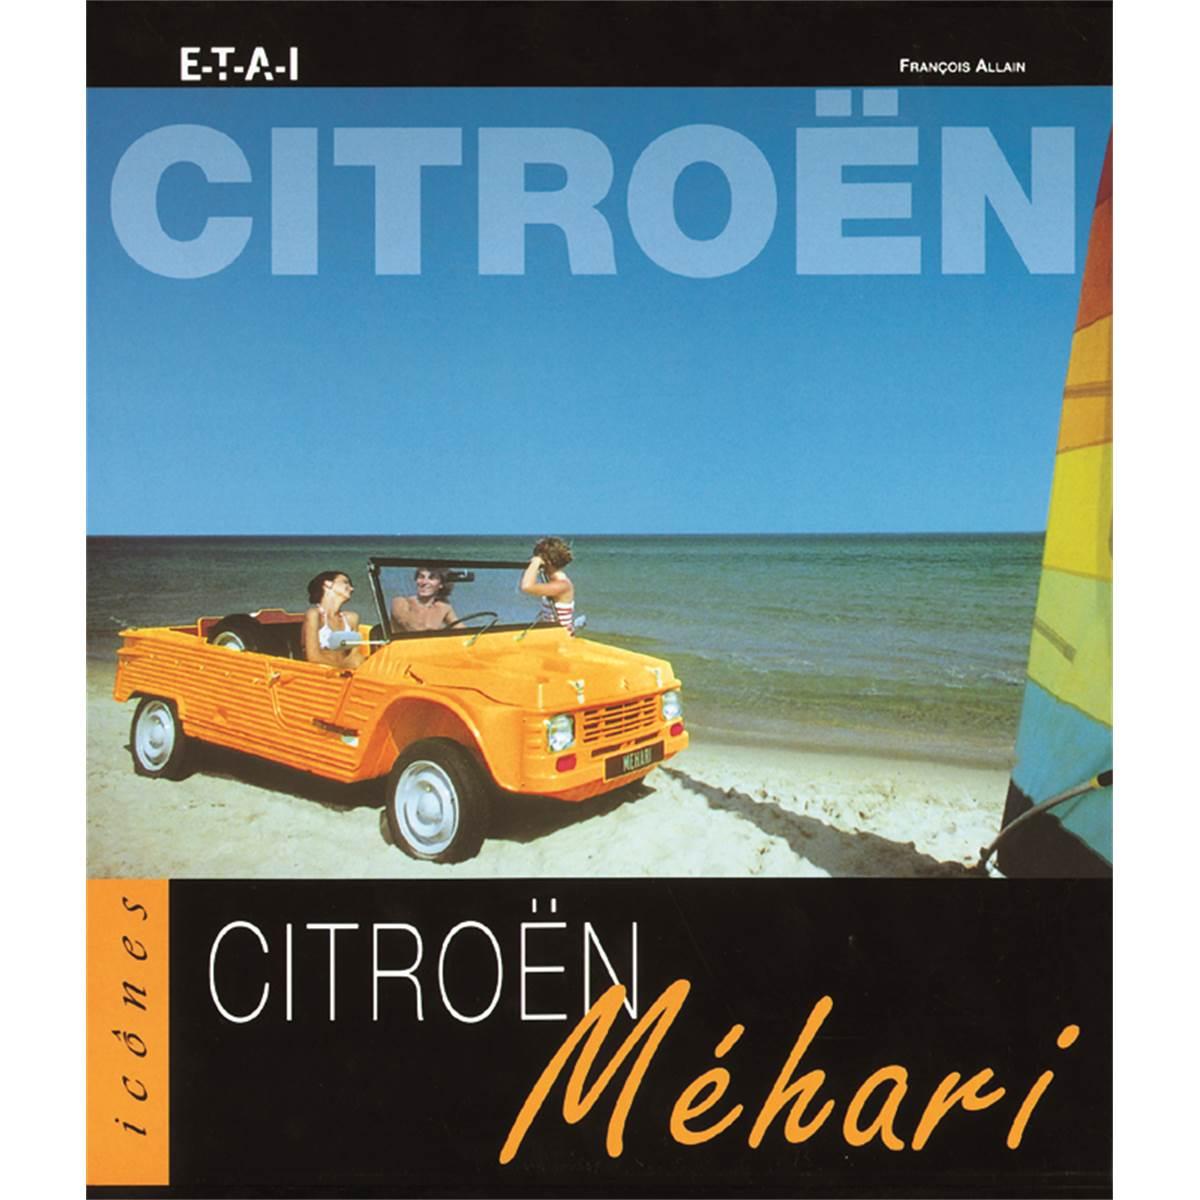 LIVRE CITROEN MEHARI (REF 18806)